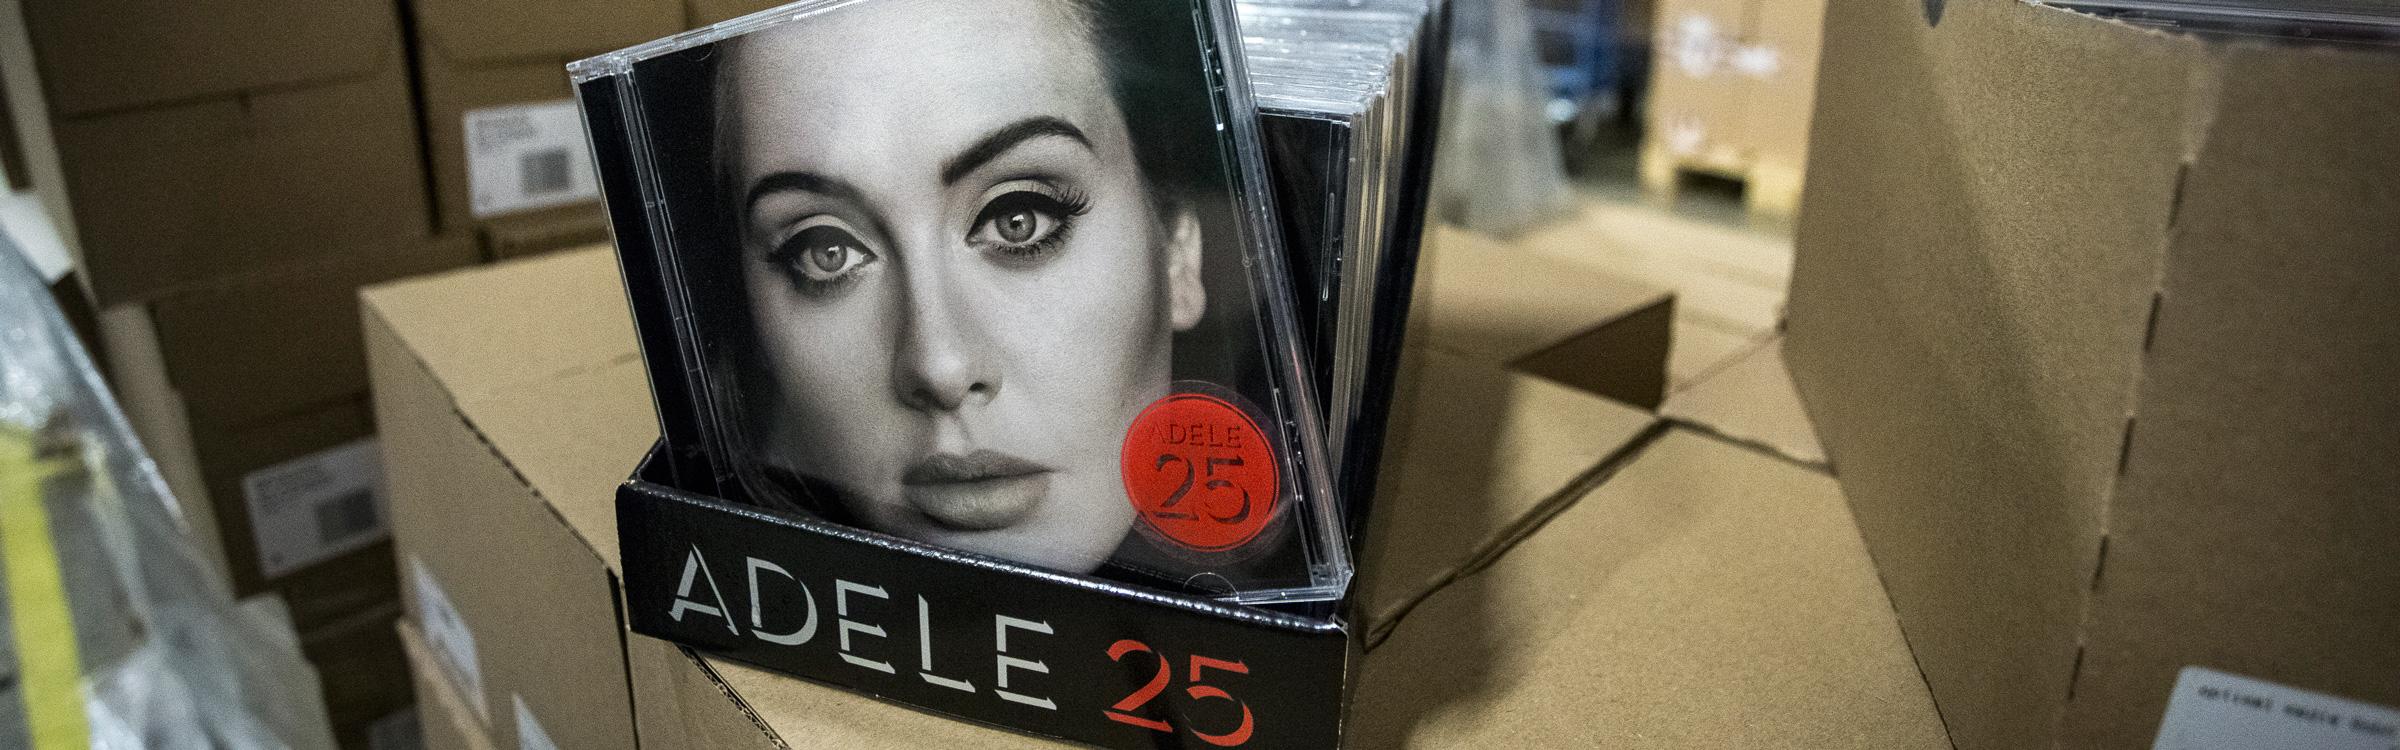 Adele  22 2 2